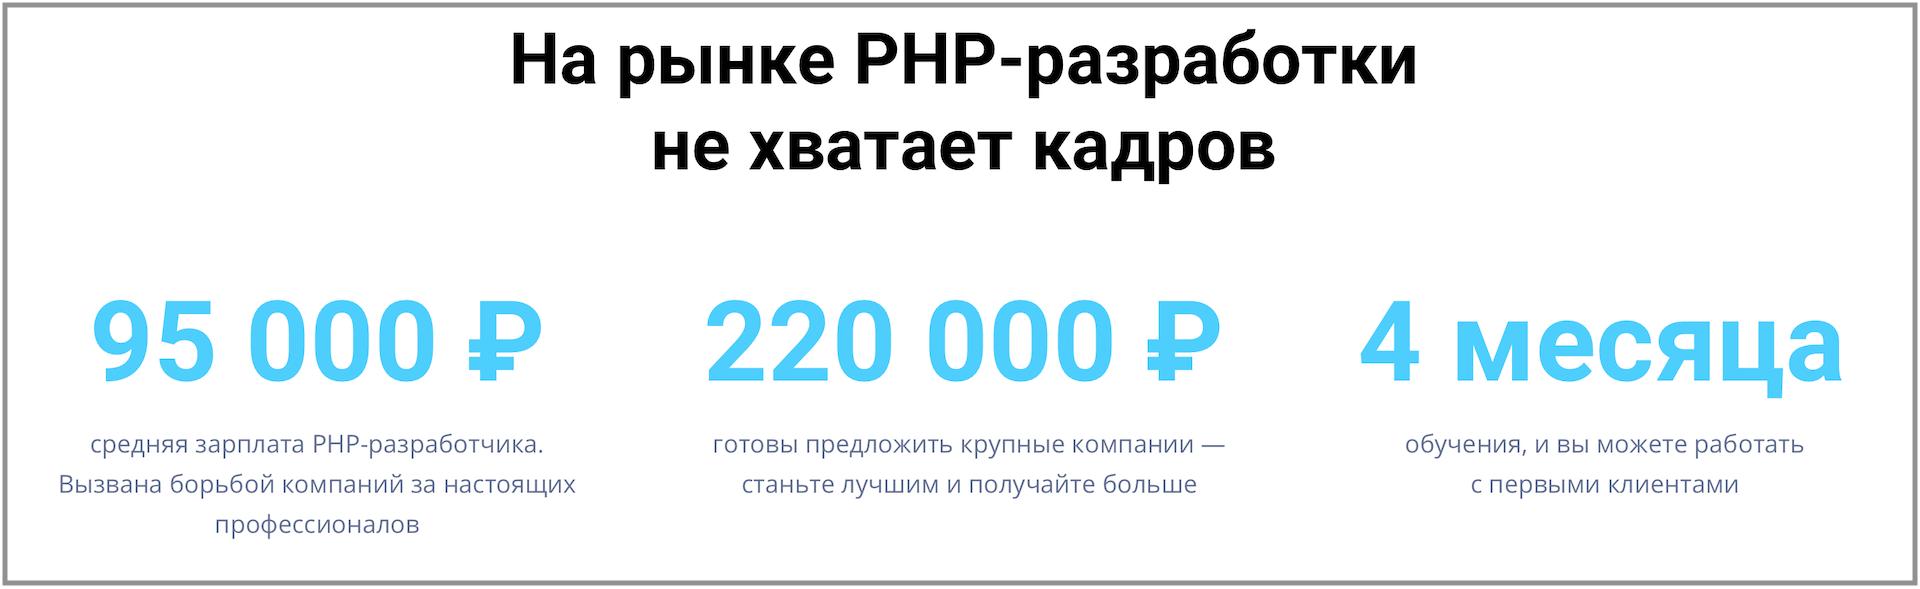 онлайн-курсы на PHP-разработчика